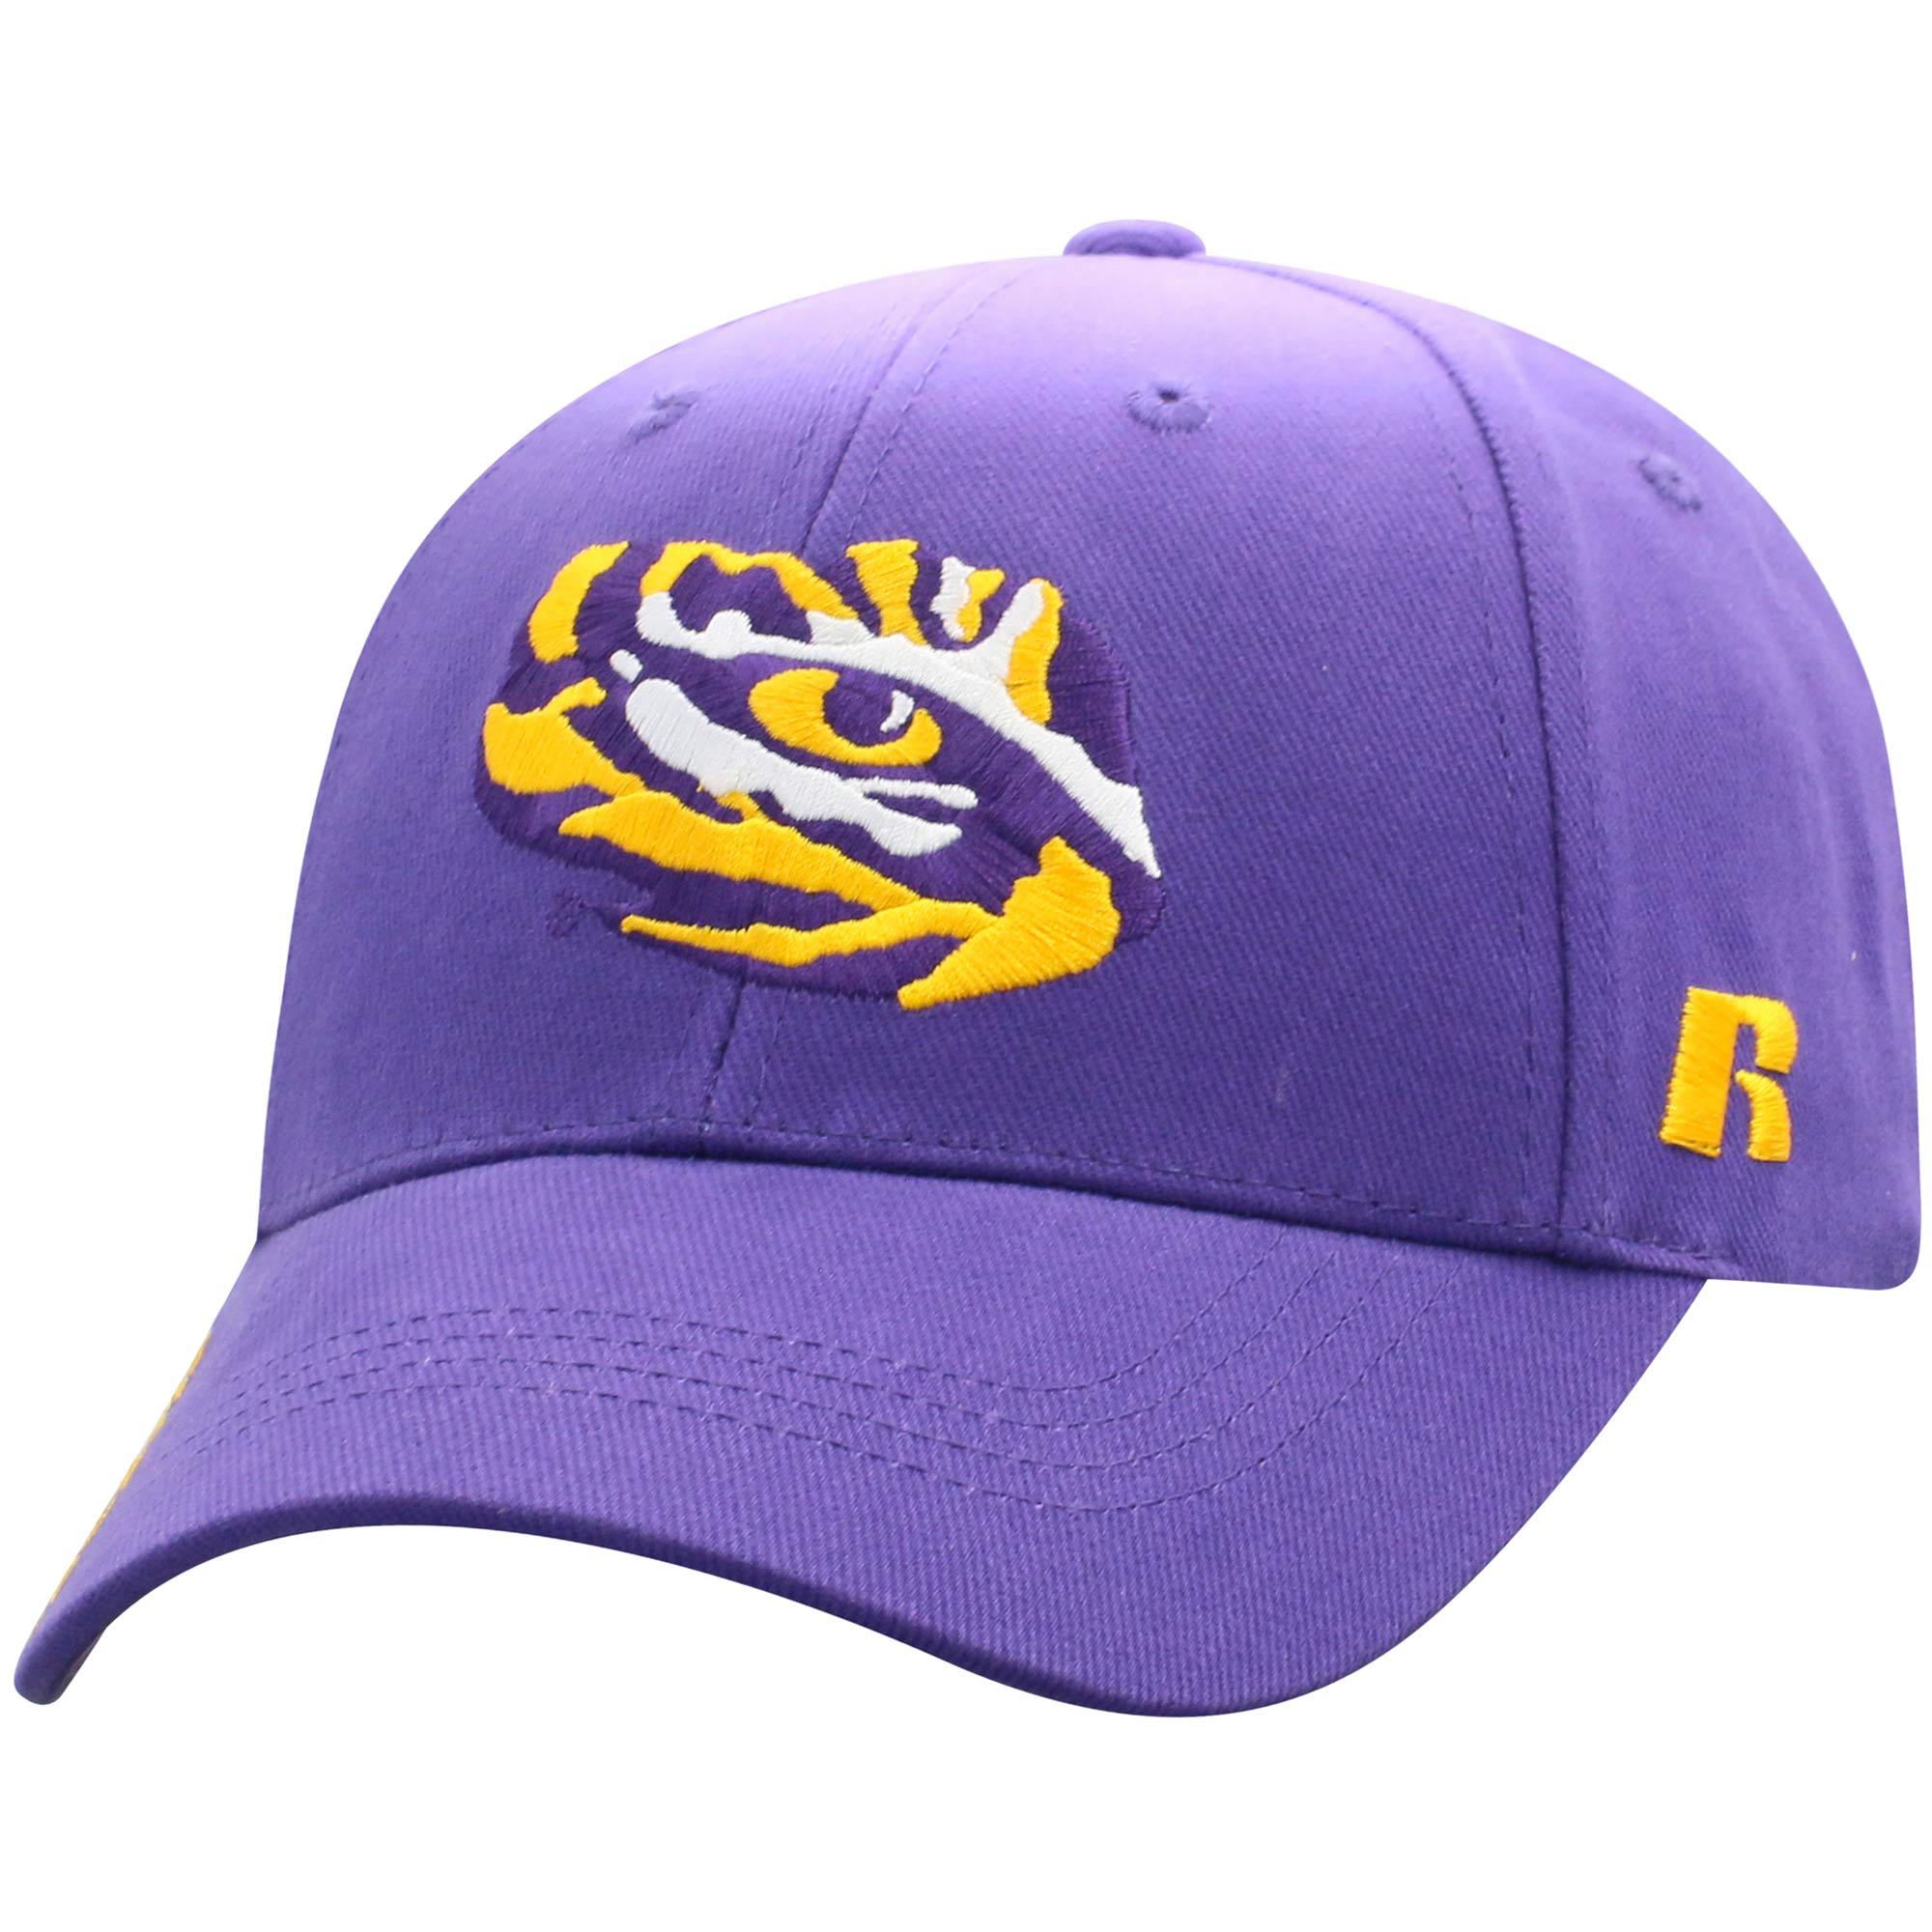 Men's Russell Purple LSU Tigers Endless Adjustable Hat - OSFA